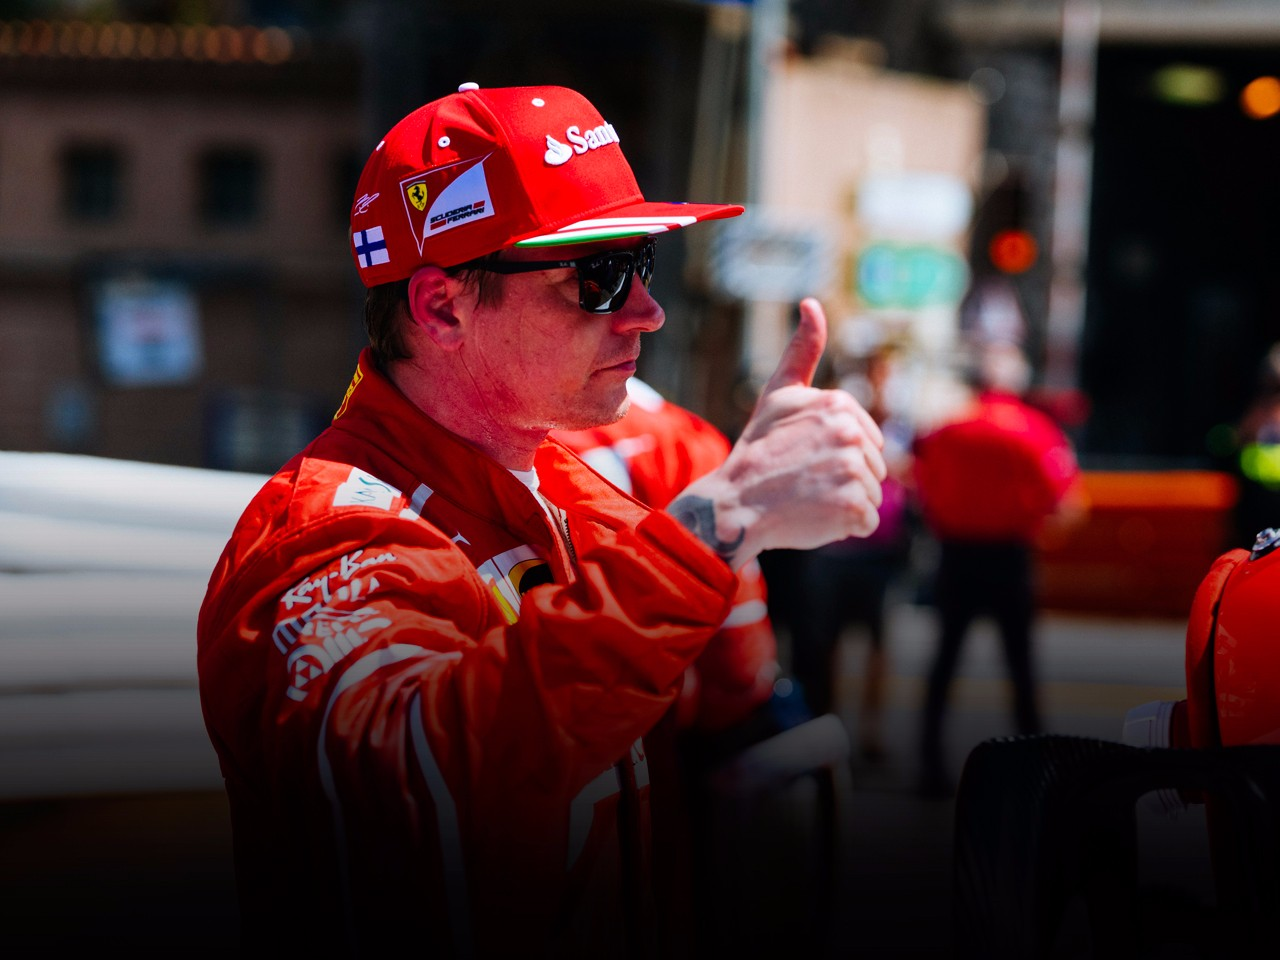 An all-Ferrari front row